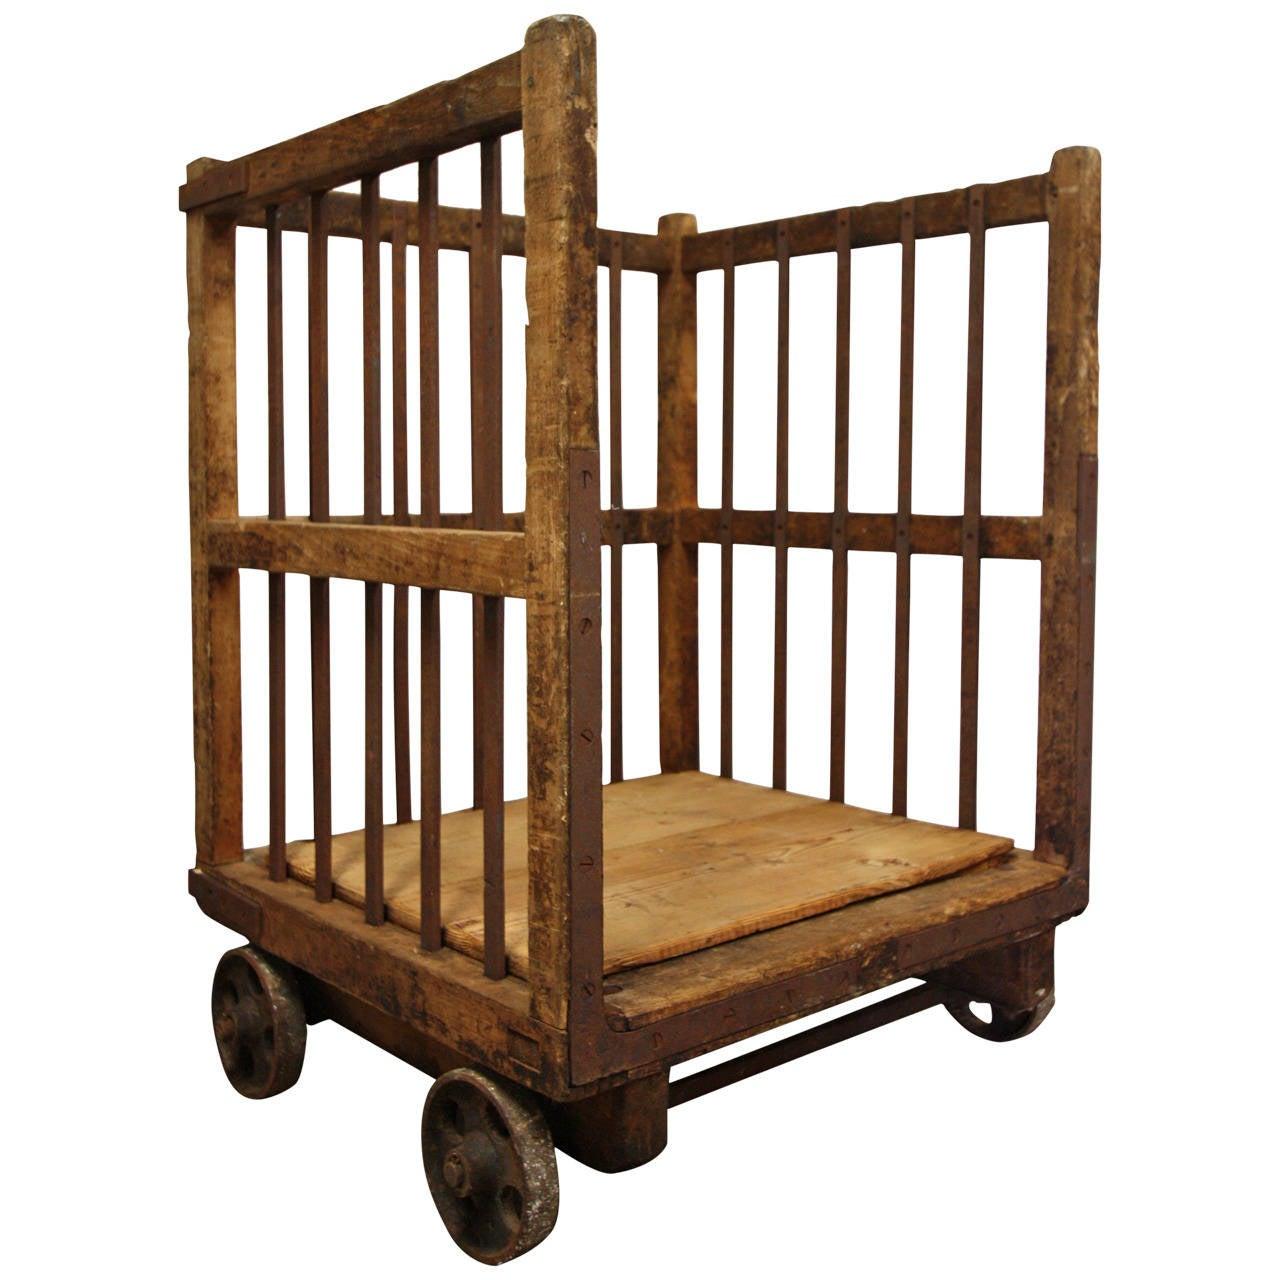 19th Century English Antique Pine Cart On Wheels At 1stdibs